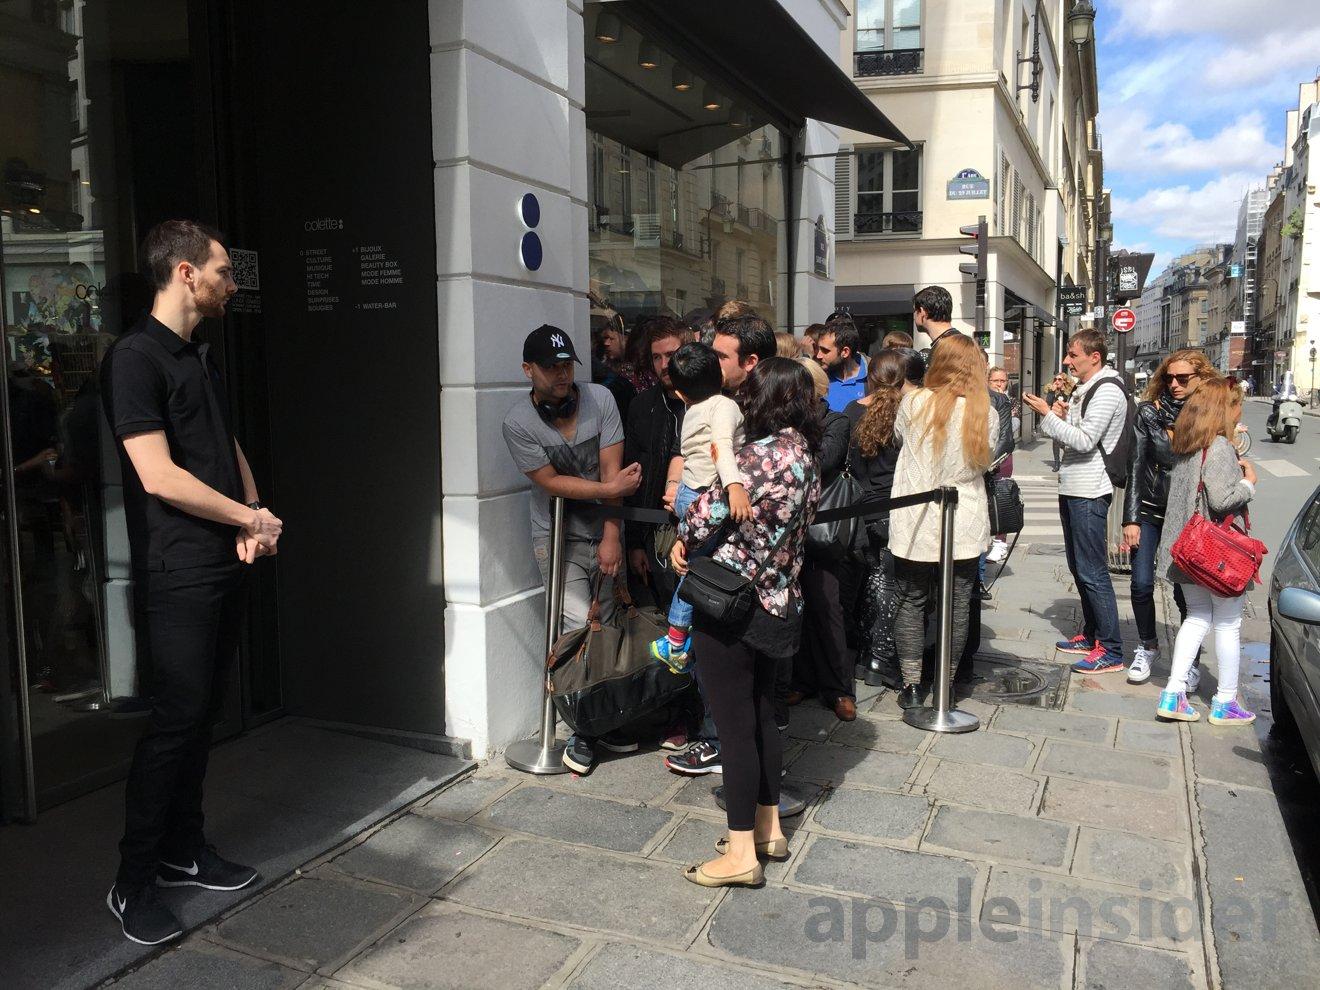 Paris Apple Watch launch week 2